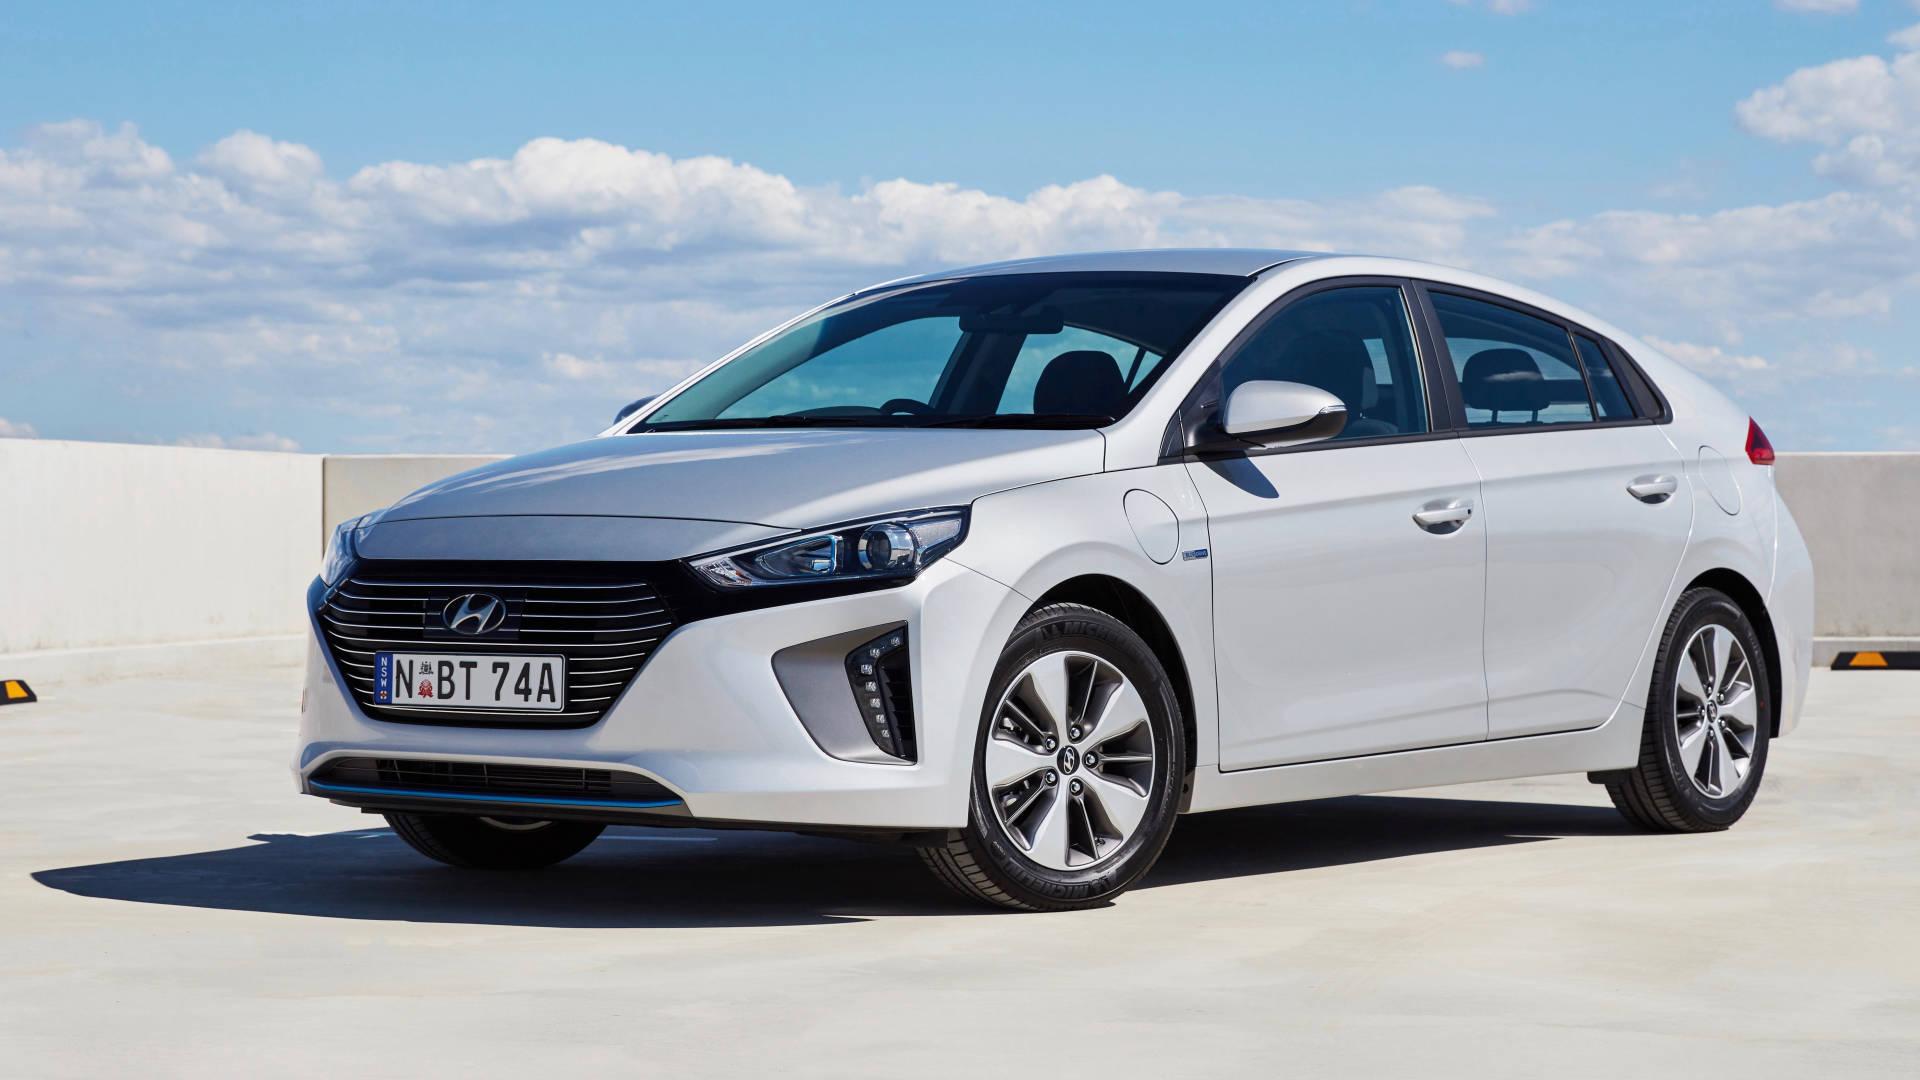 2019 Hyundai Ioniq Elite plug-in front 3/4